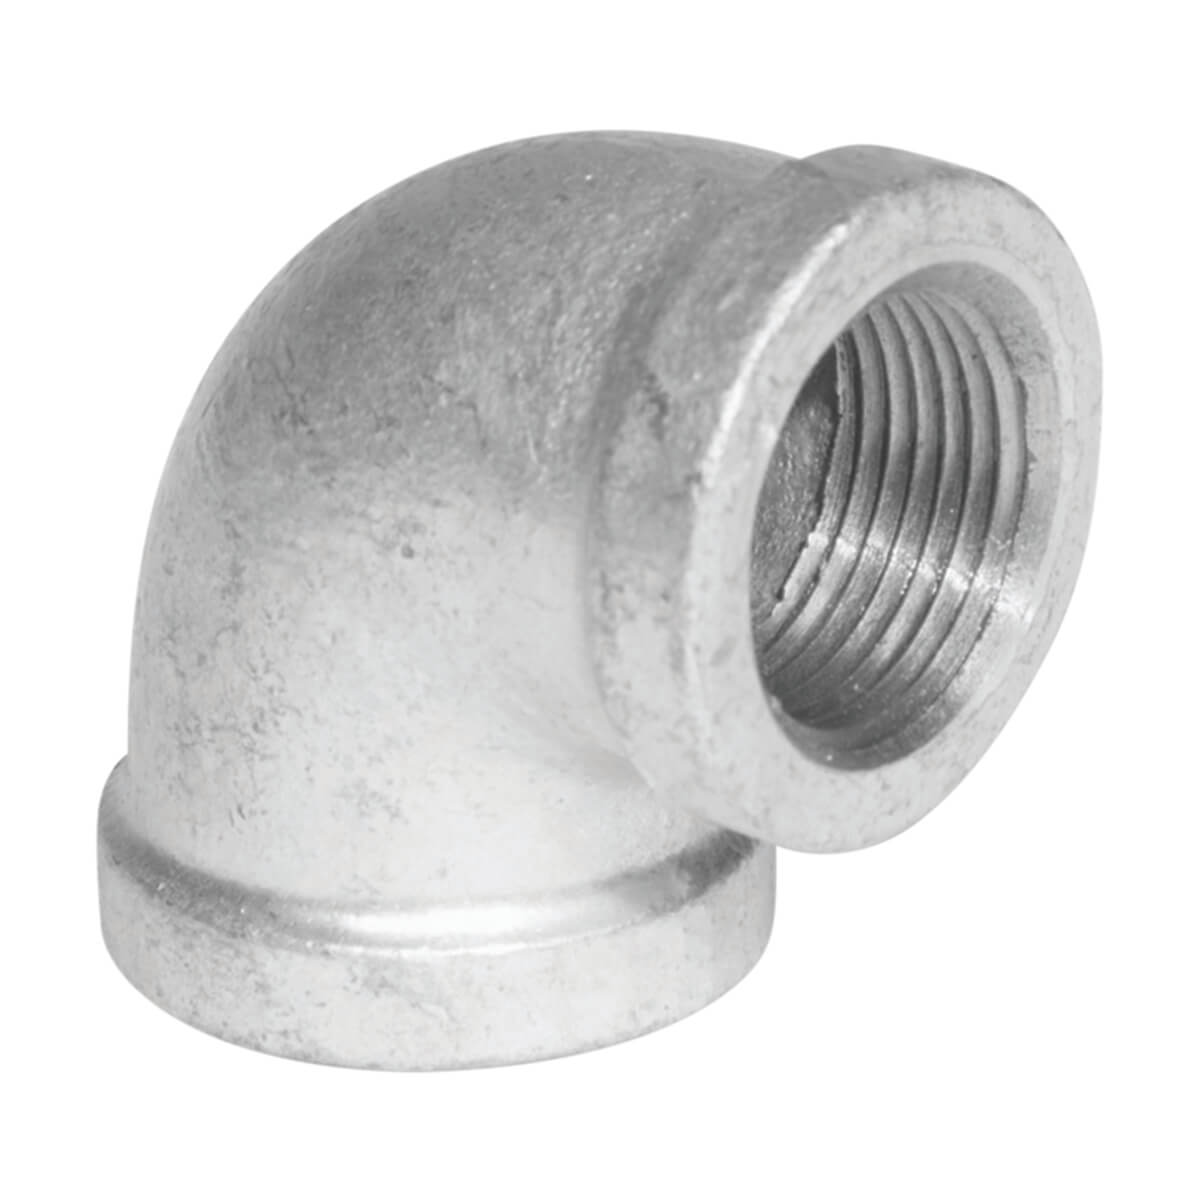 Fitting Galvanized Iron 90° Elbow - 2-in